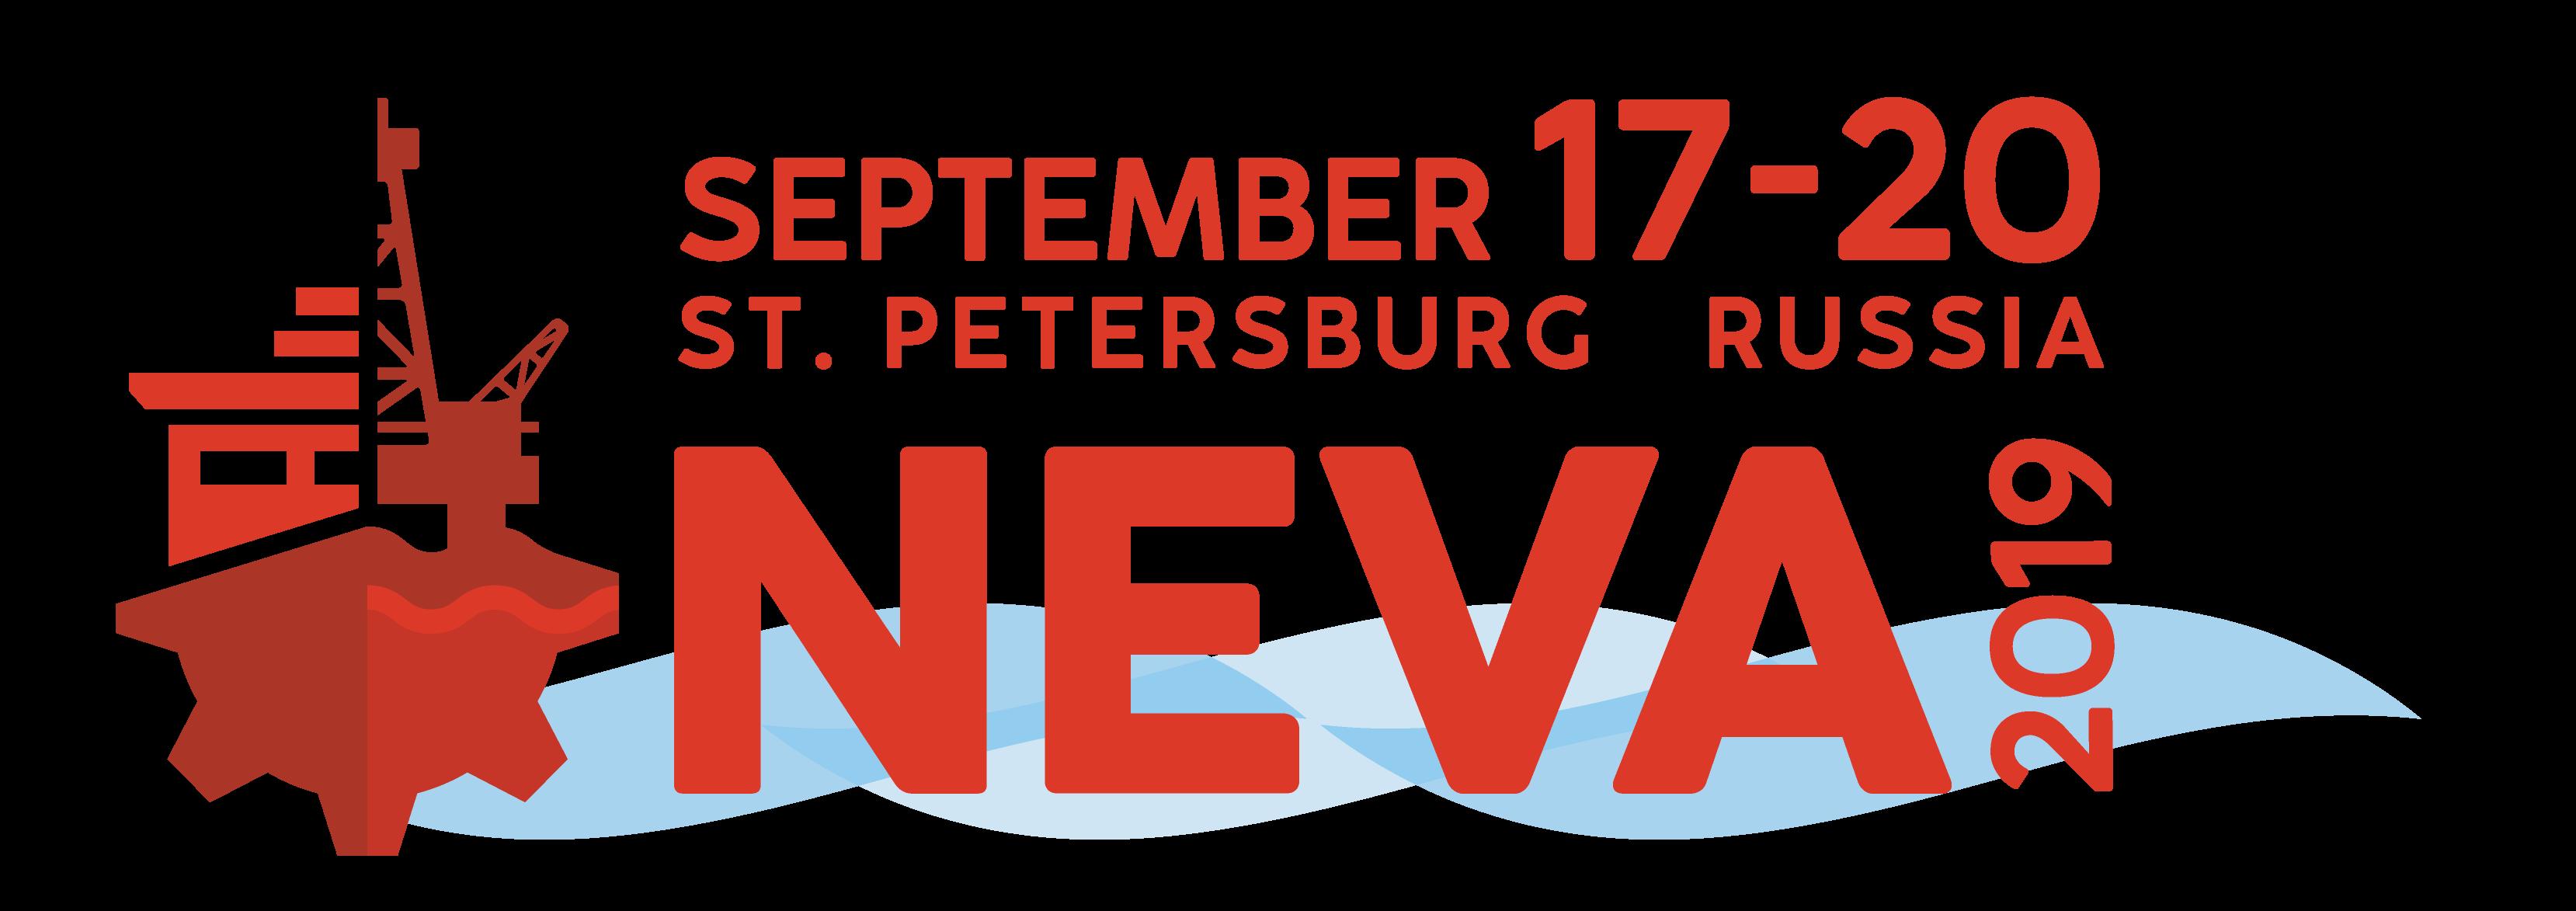 Submit a Detailed NEVA 2019 Exhibitor Profile